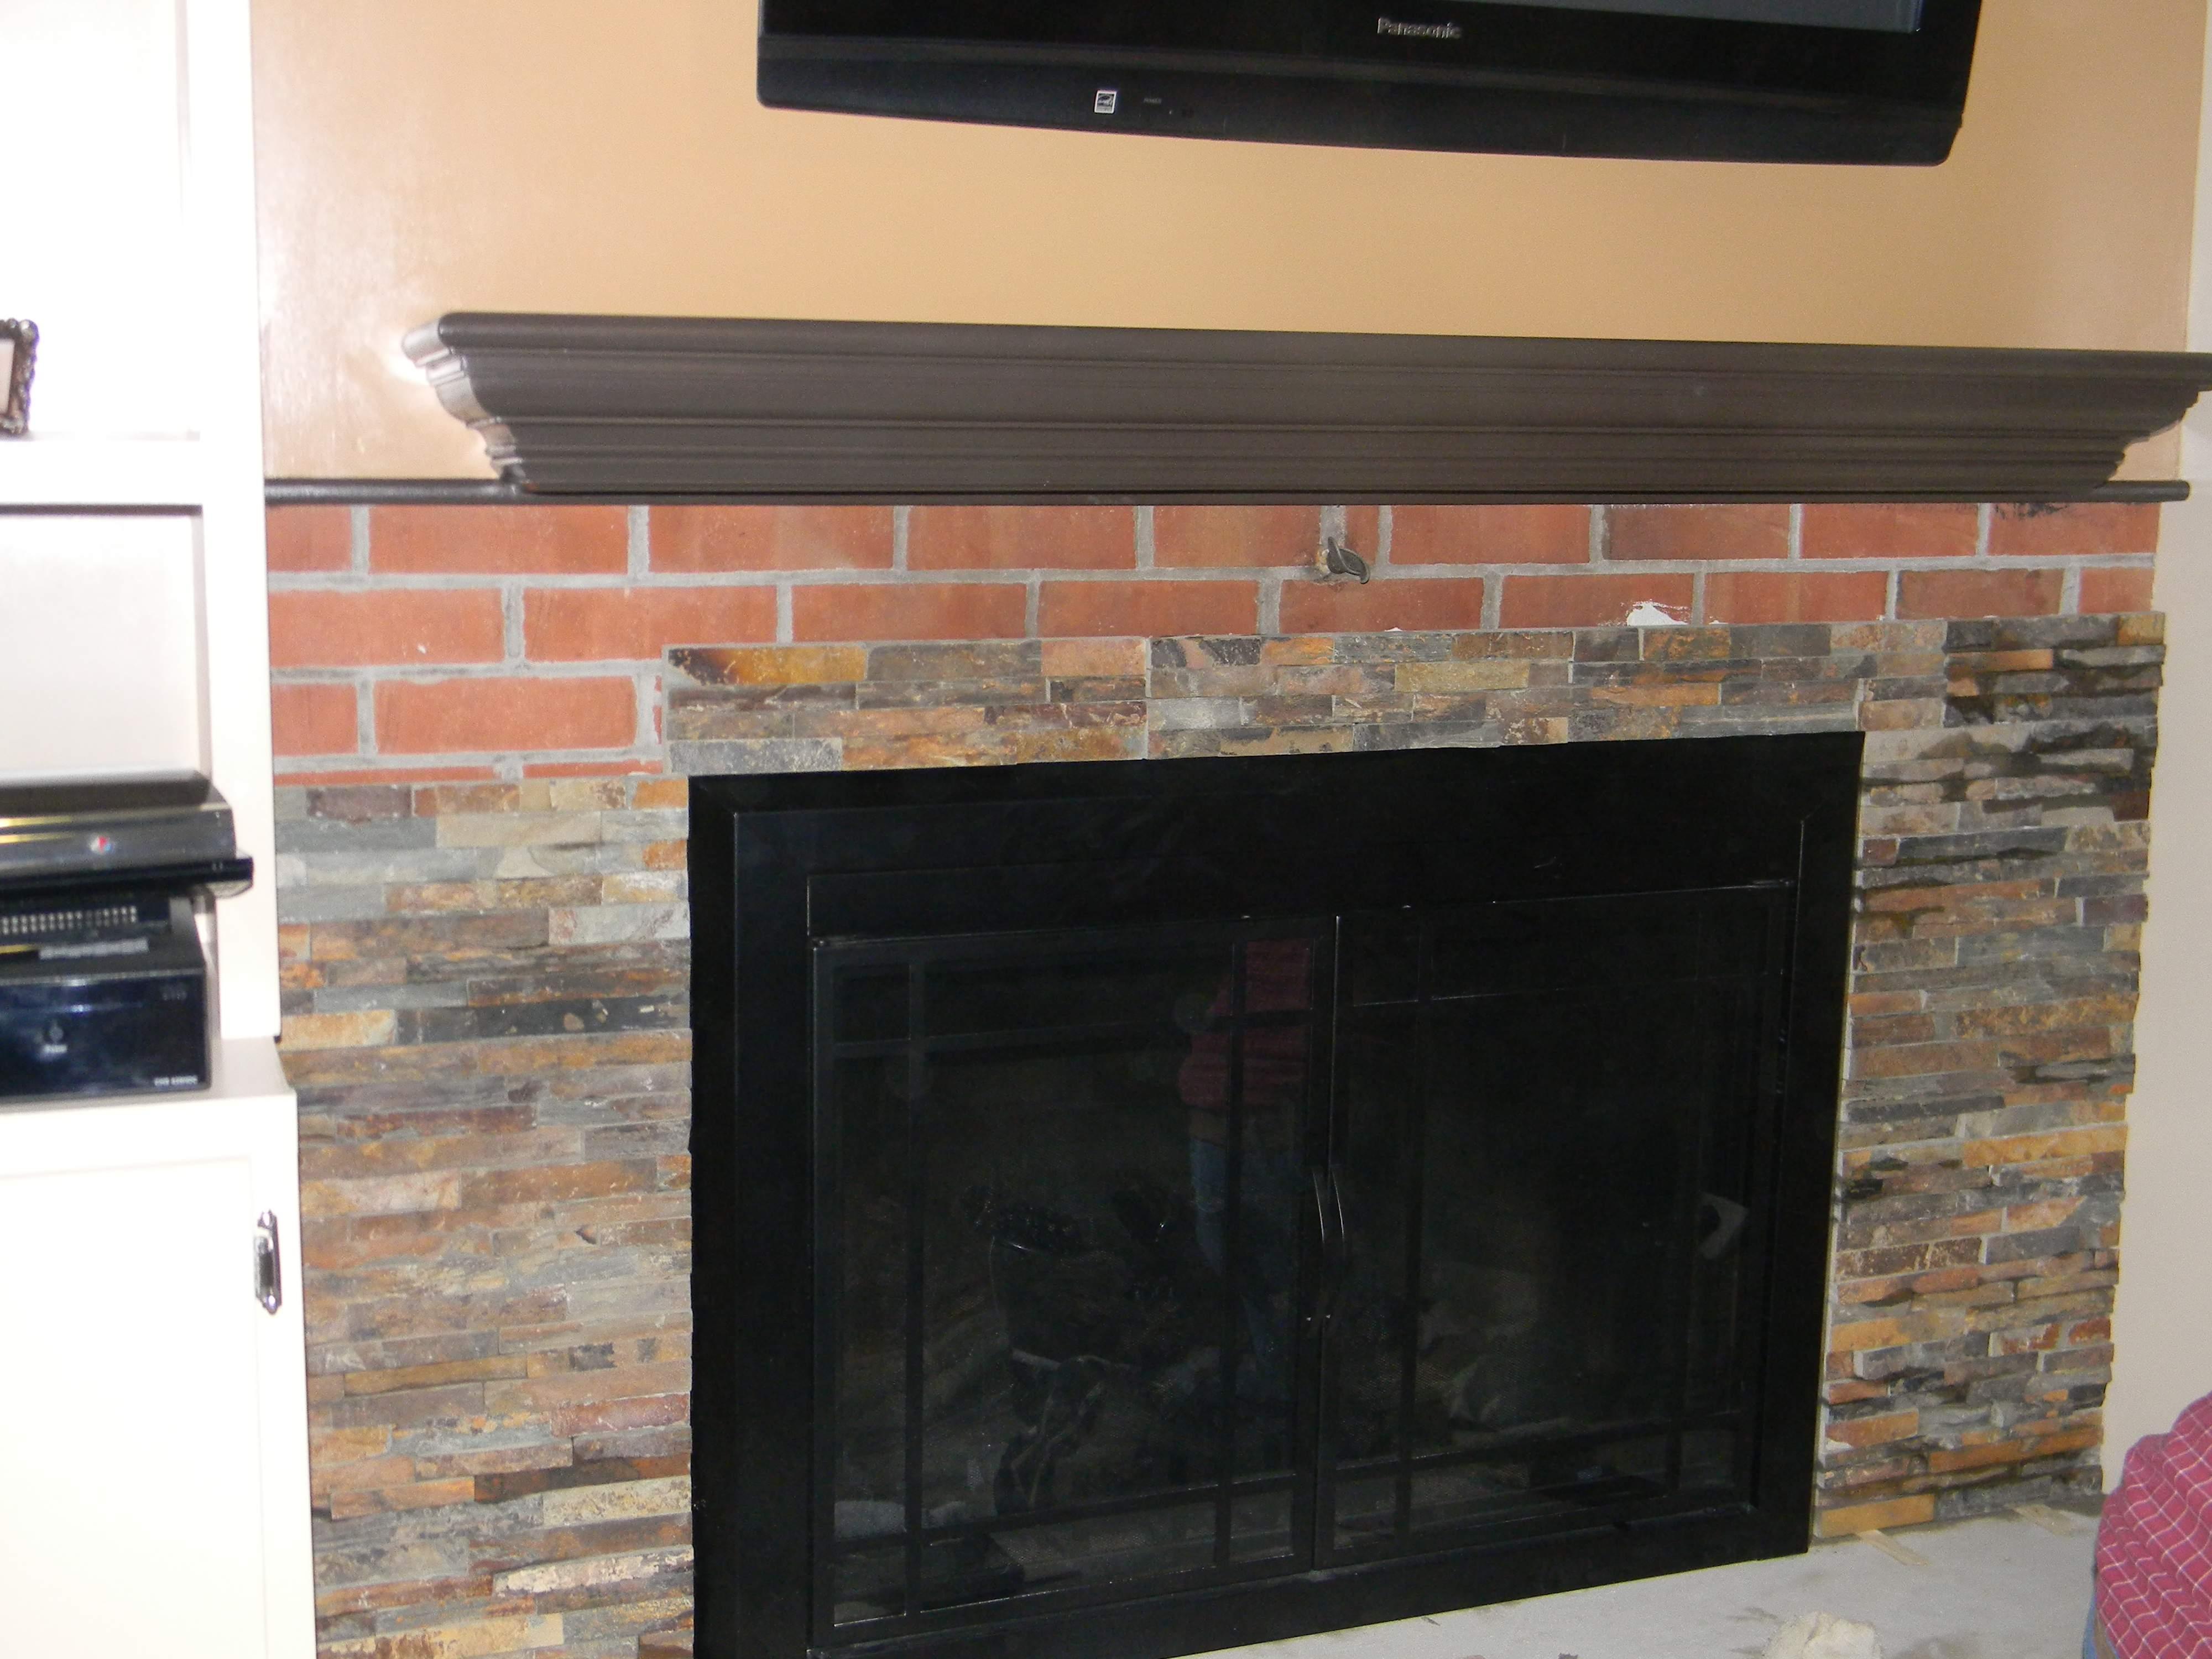 ideas to cover brick fireplace ideas to cover brick fireplace new cover brick fireplace with faux stone bjhryz